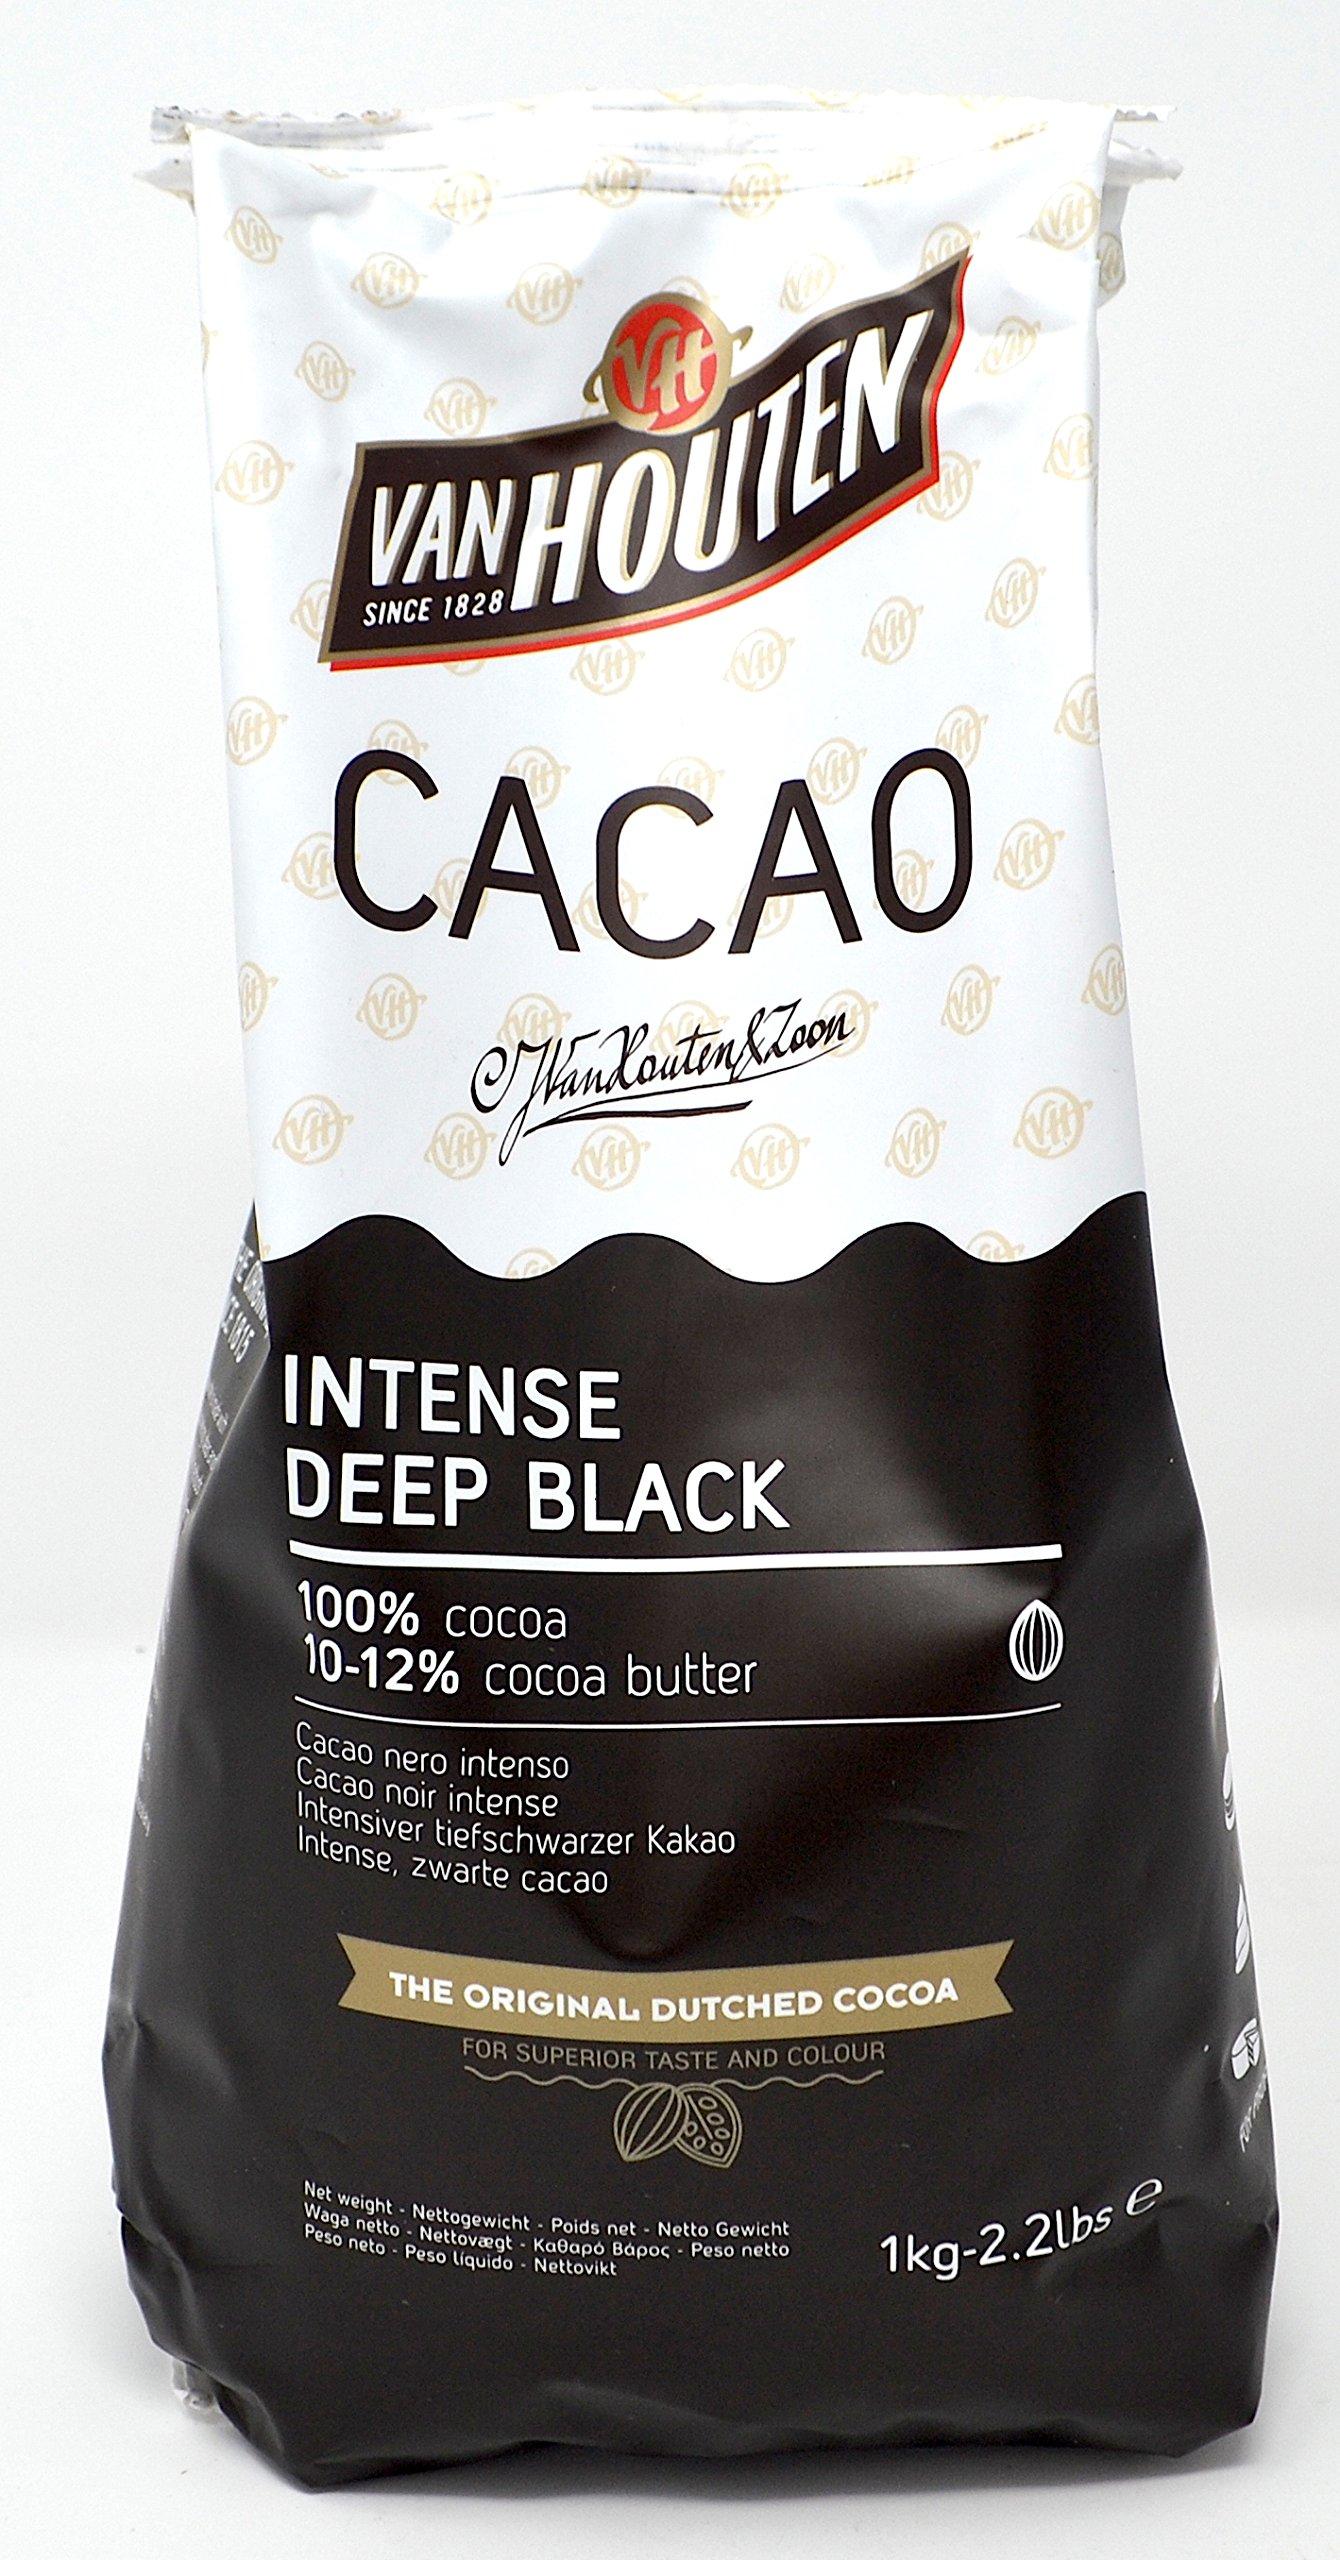 Van Houten - Intense Deep Black Cocoa Powder (10-12% Cocoa Butter) 1kg